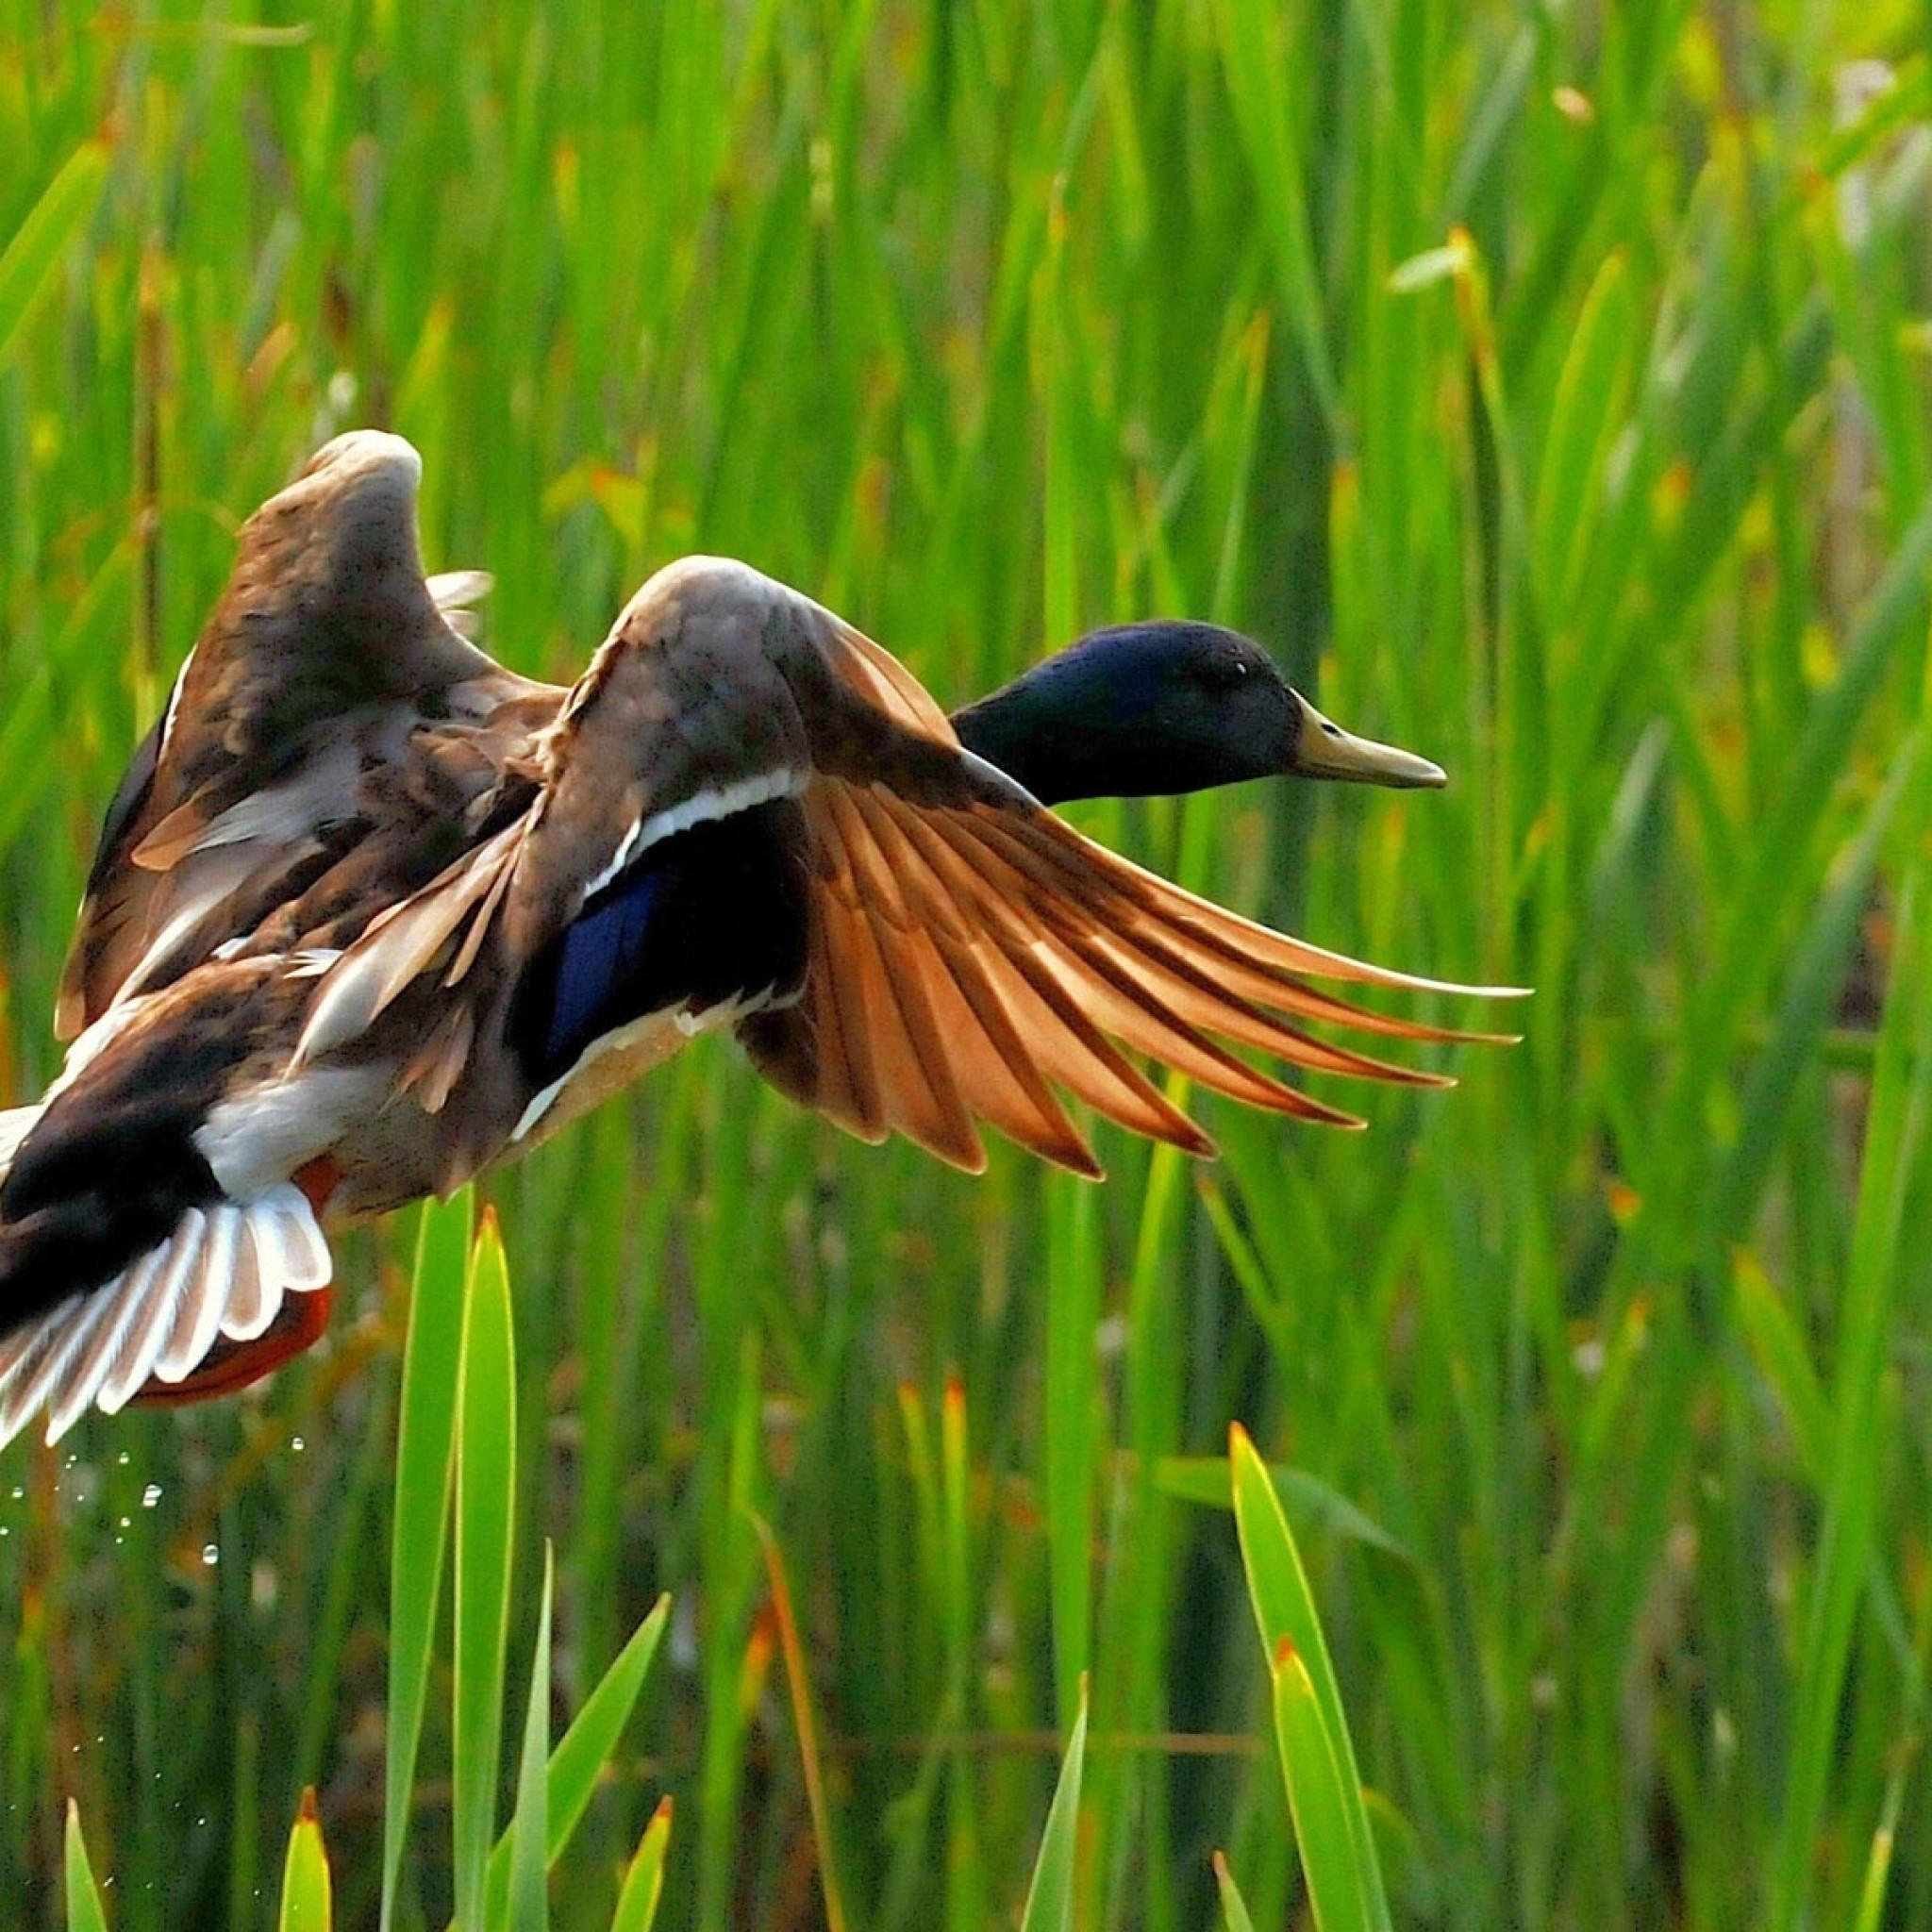 flying-duck-2048x2048